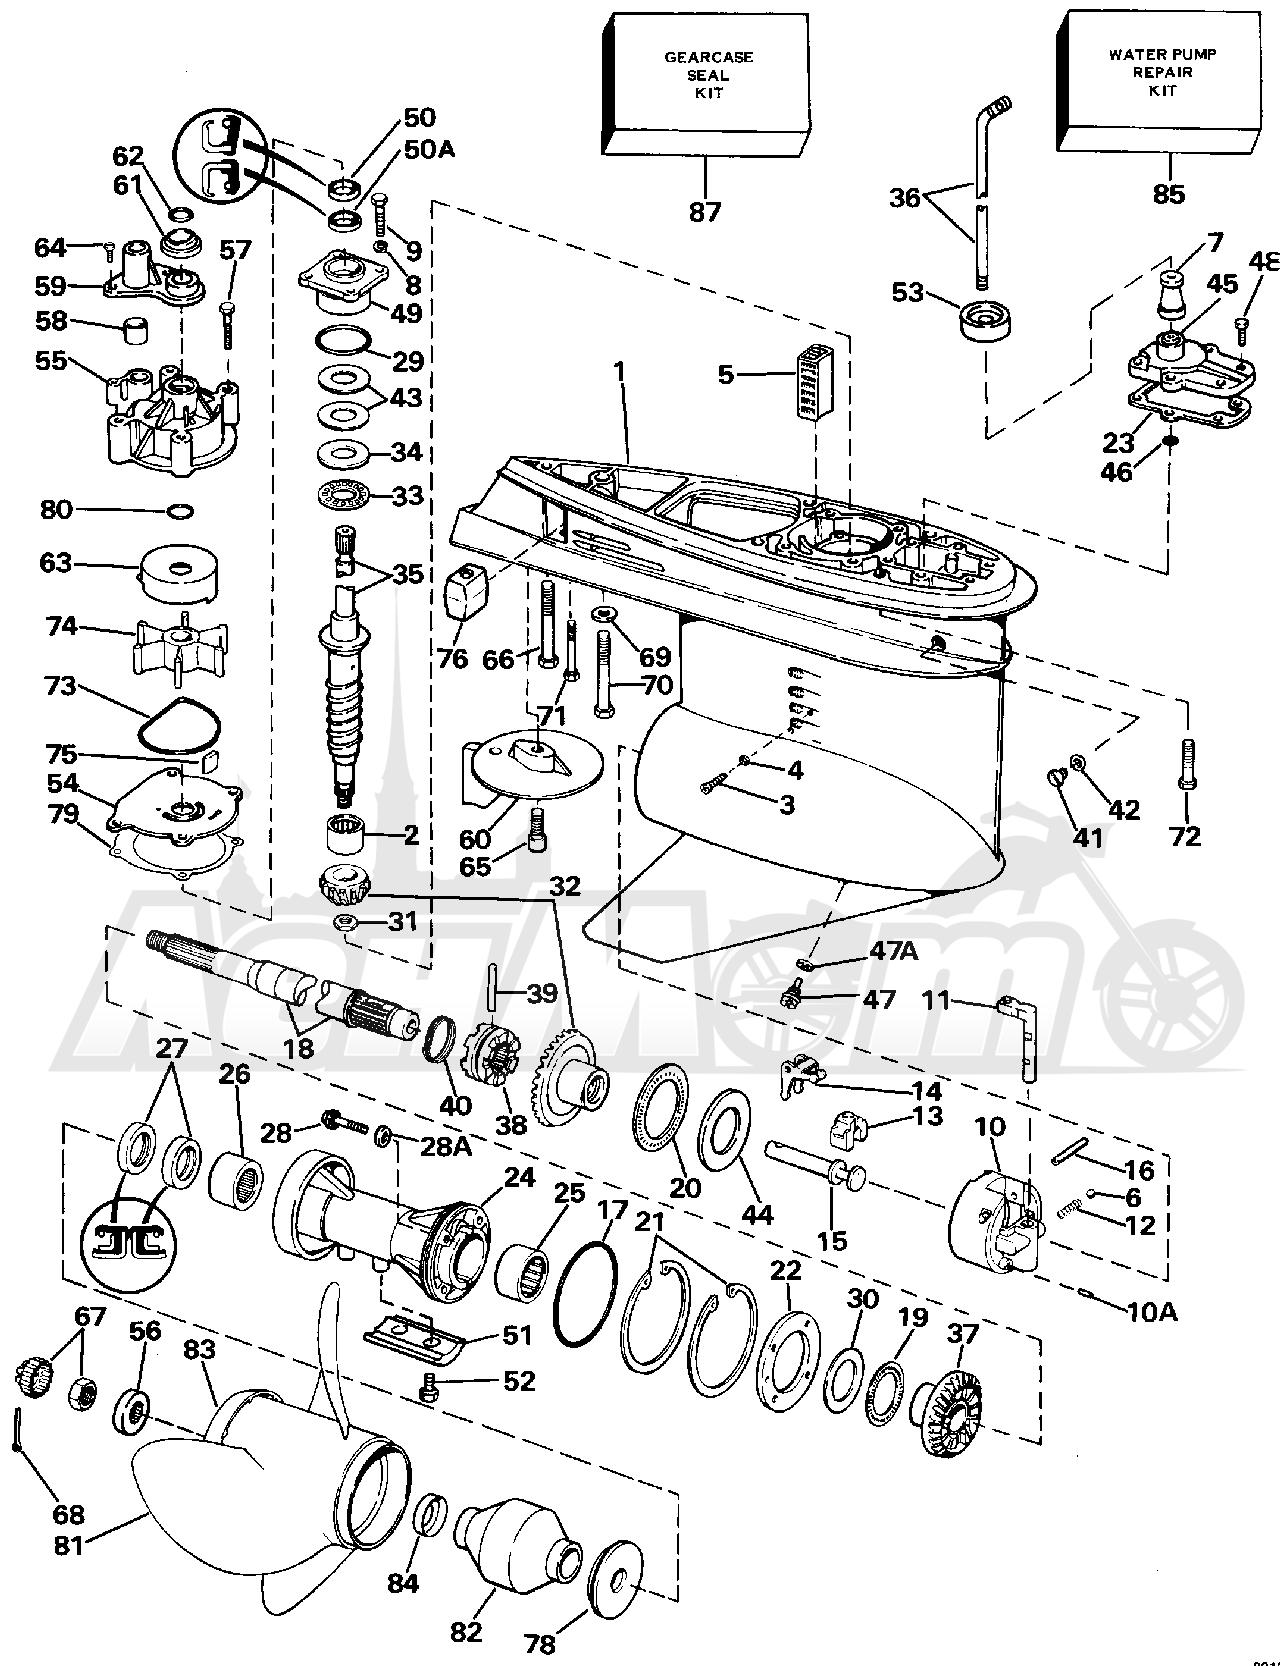 diagram of 1988 e200cxccr evinrude intake manifold diagram With diagram of 1988 e200cxccr evinrude intake manifold diagram and parts